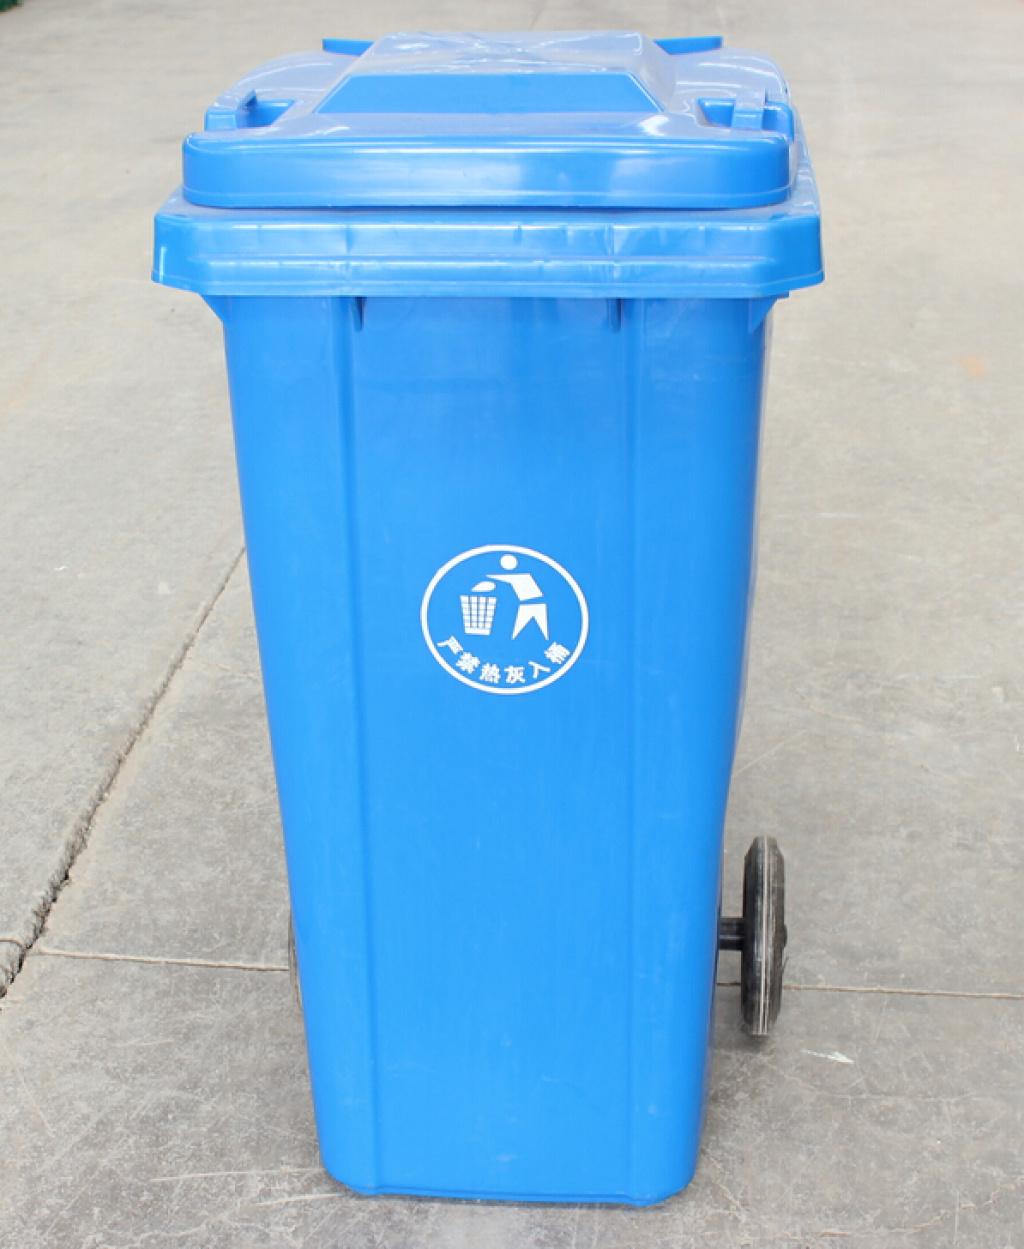 120l塑料垃圾桶_庆云瑞洁环卫设备有限公司